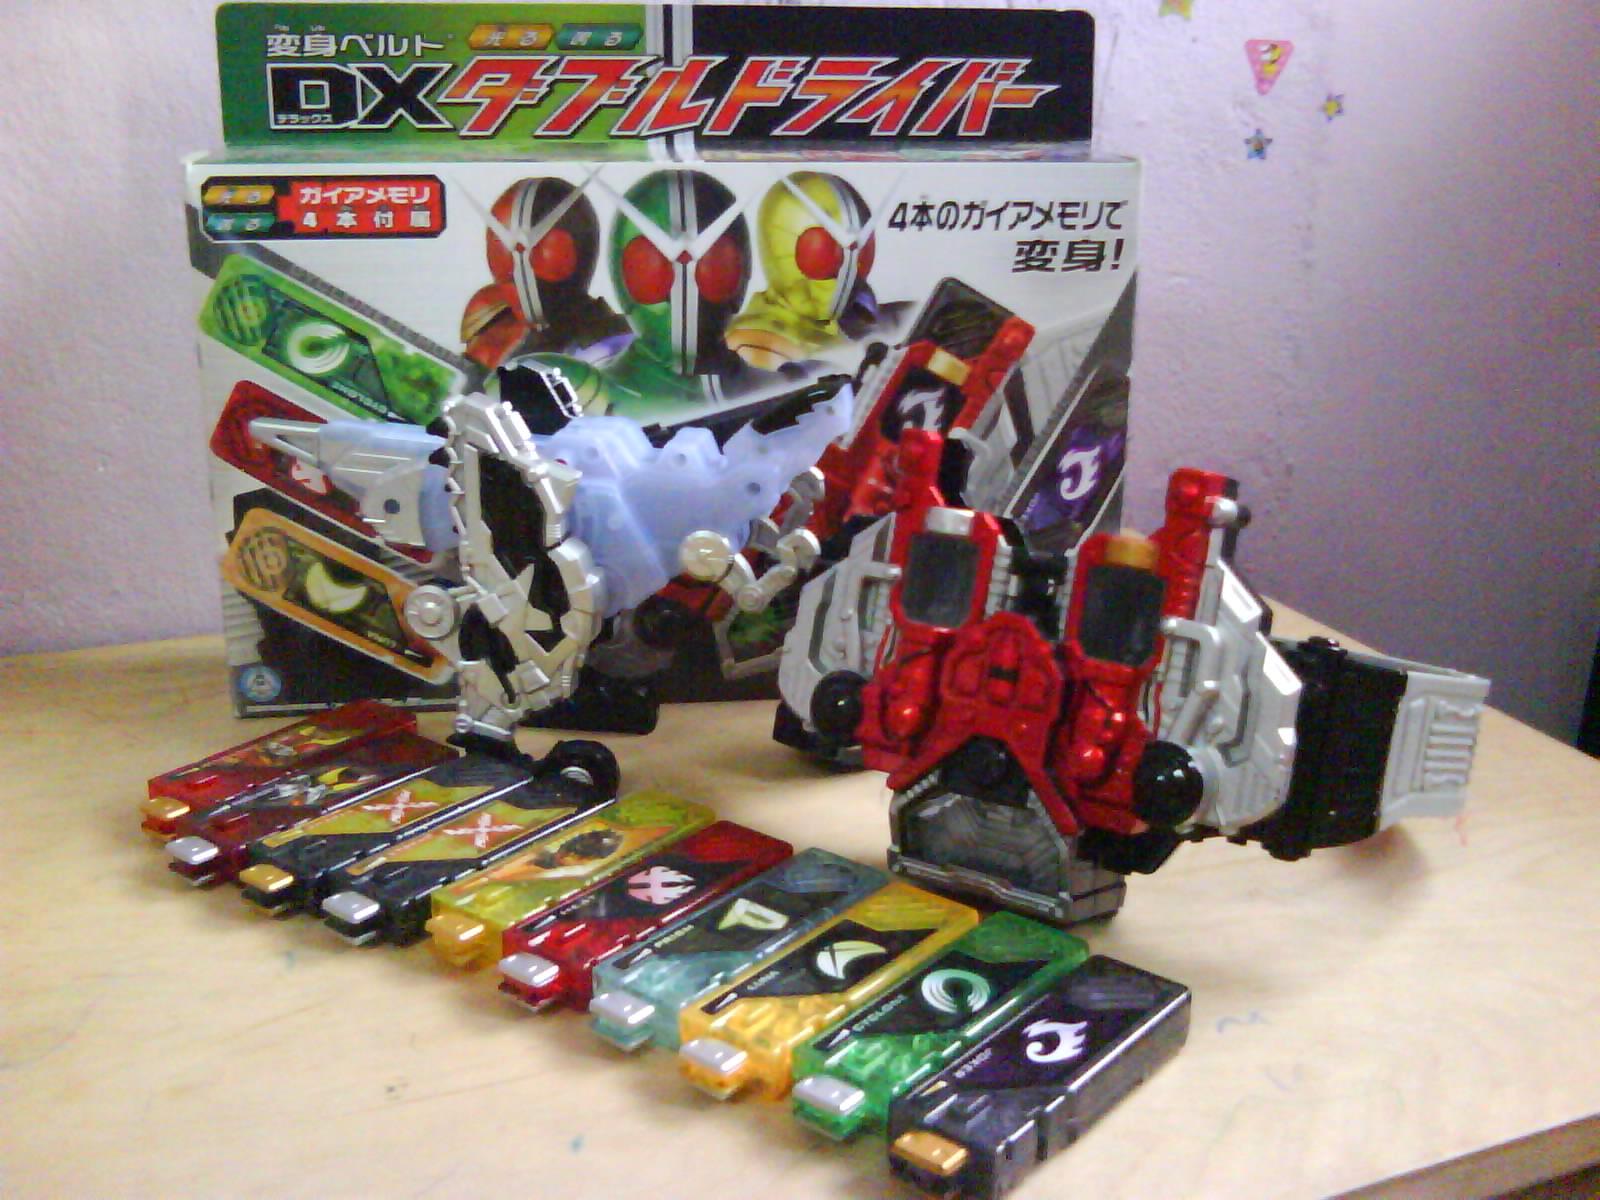 Kamen rider w belt fang